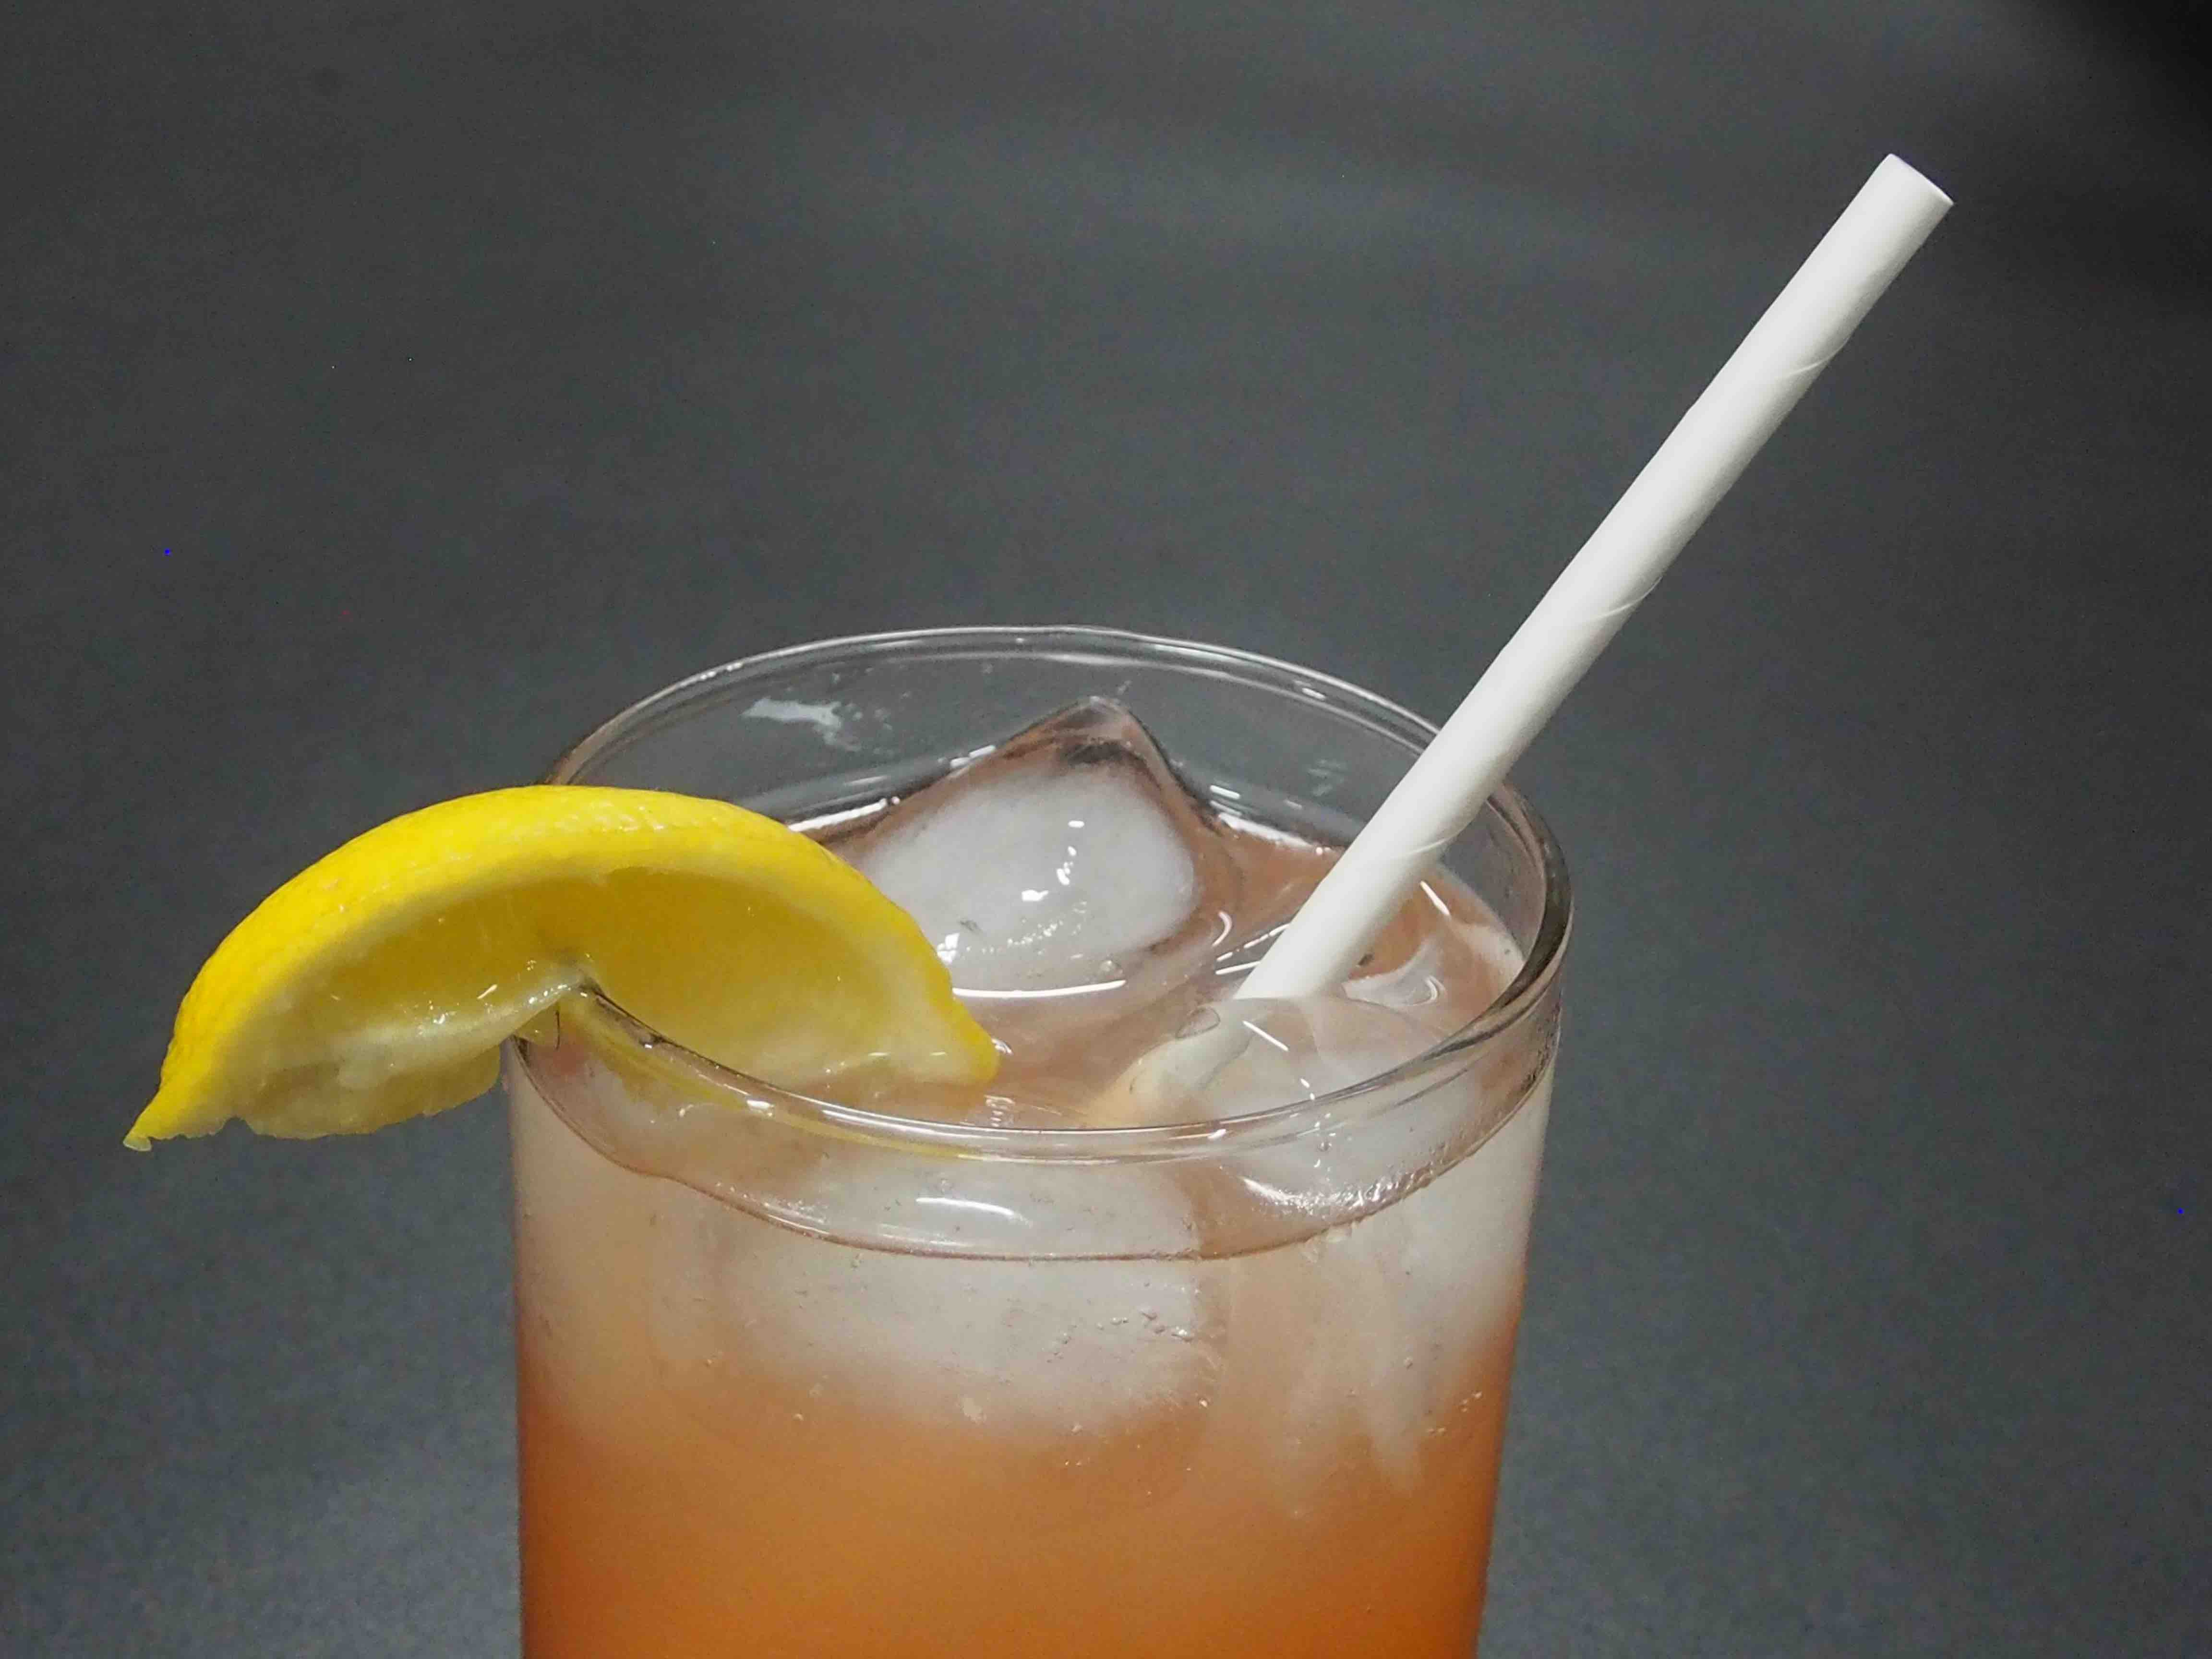 paper straw in lemonade 2